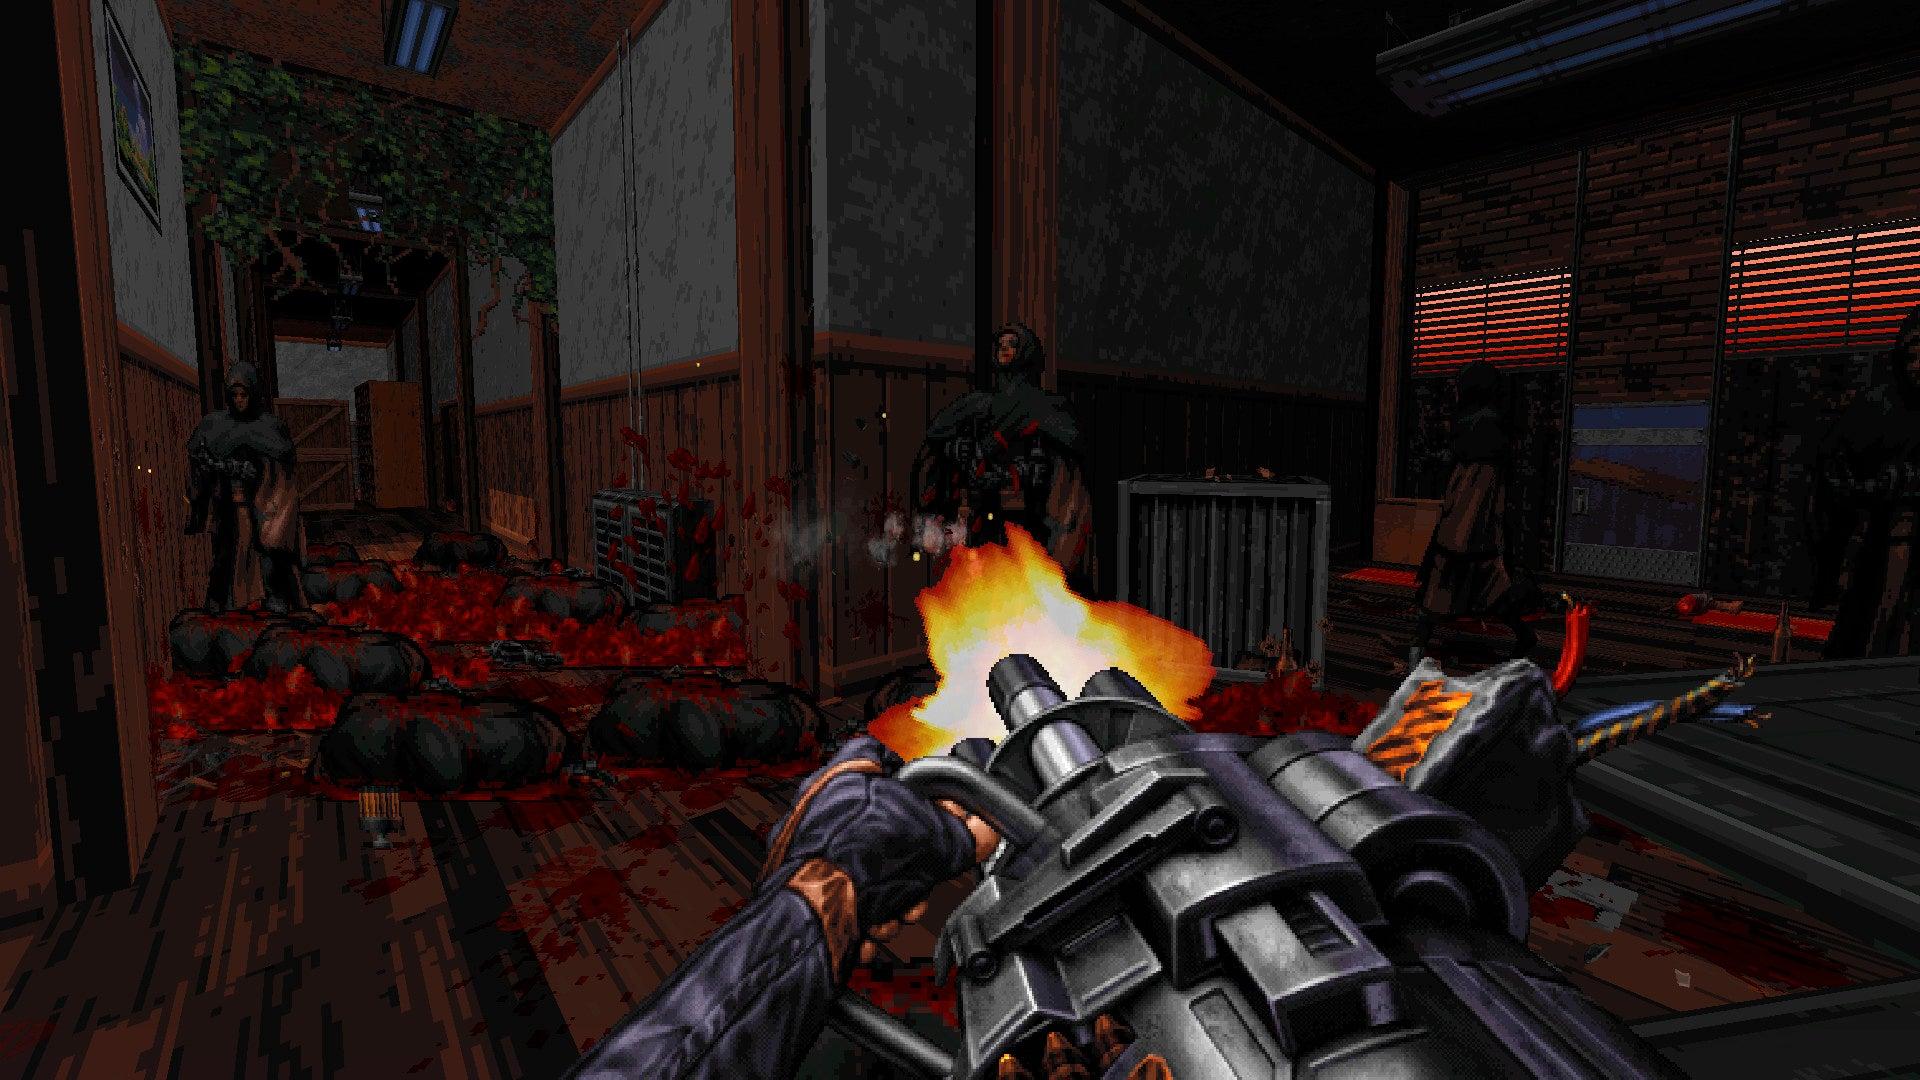 Image for Ion Maiden is a modern shooter built on Duke Nukem 3D's Build engine